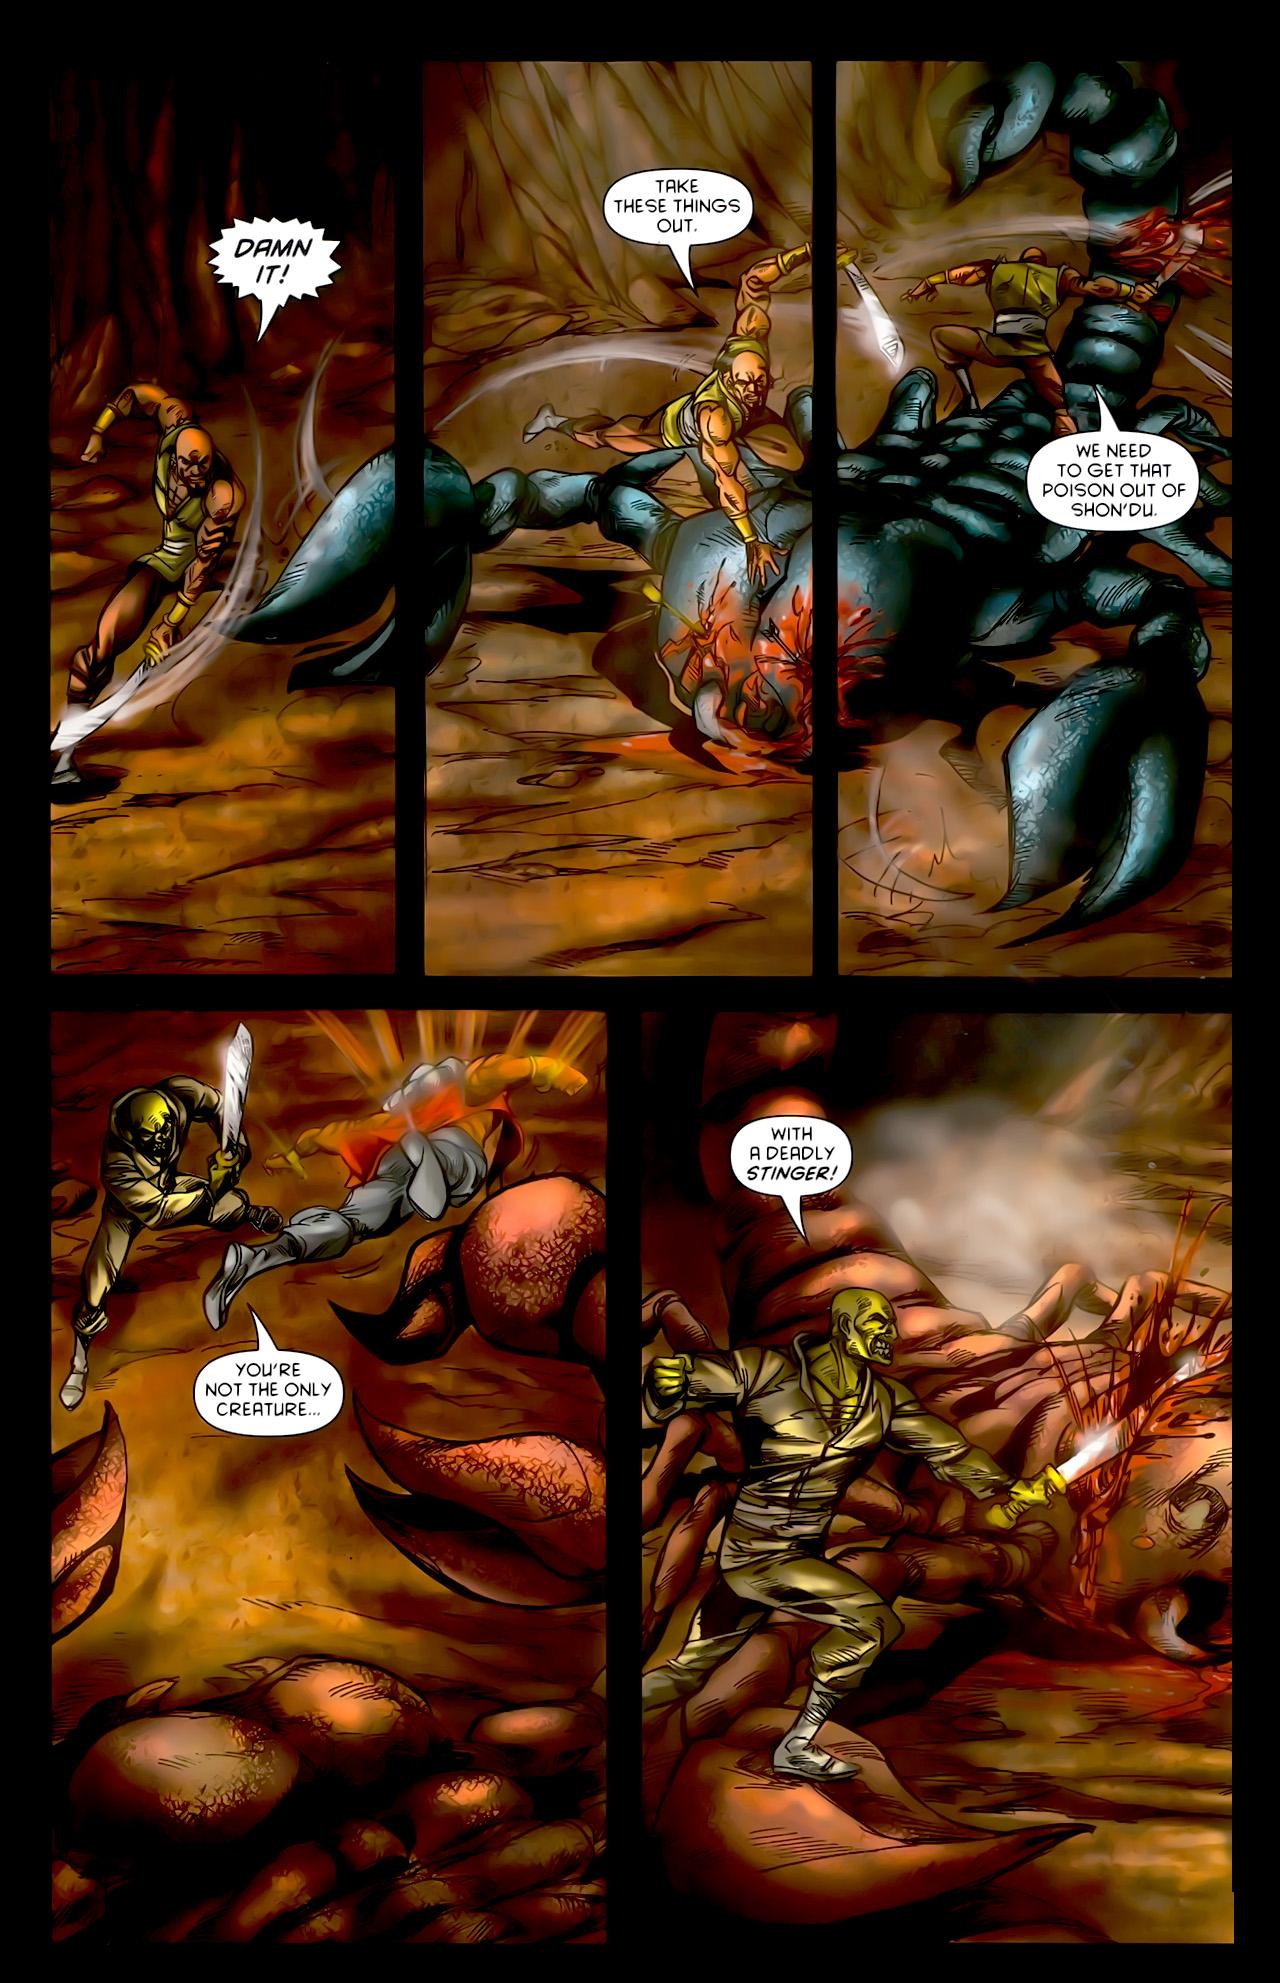 Read online 1001 Arabian Nights: The Adventures of Sinbad comic -  Issue #10 - 19